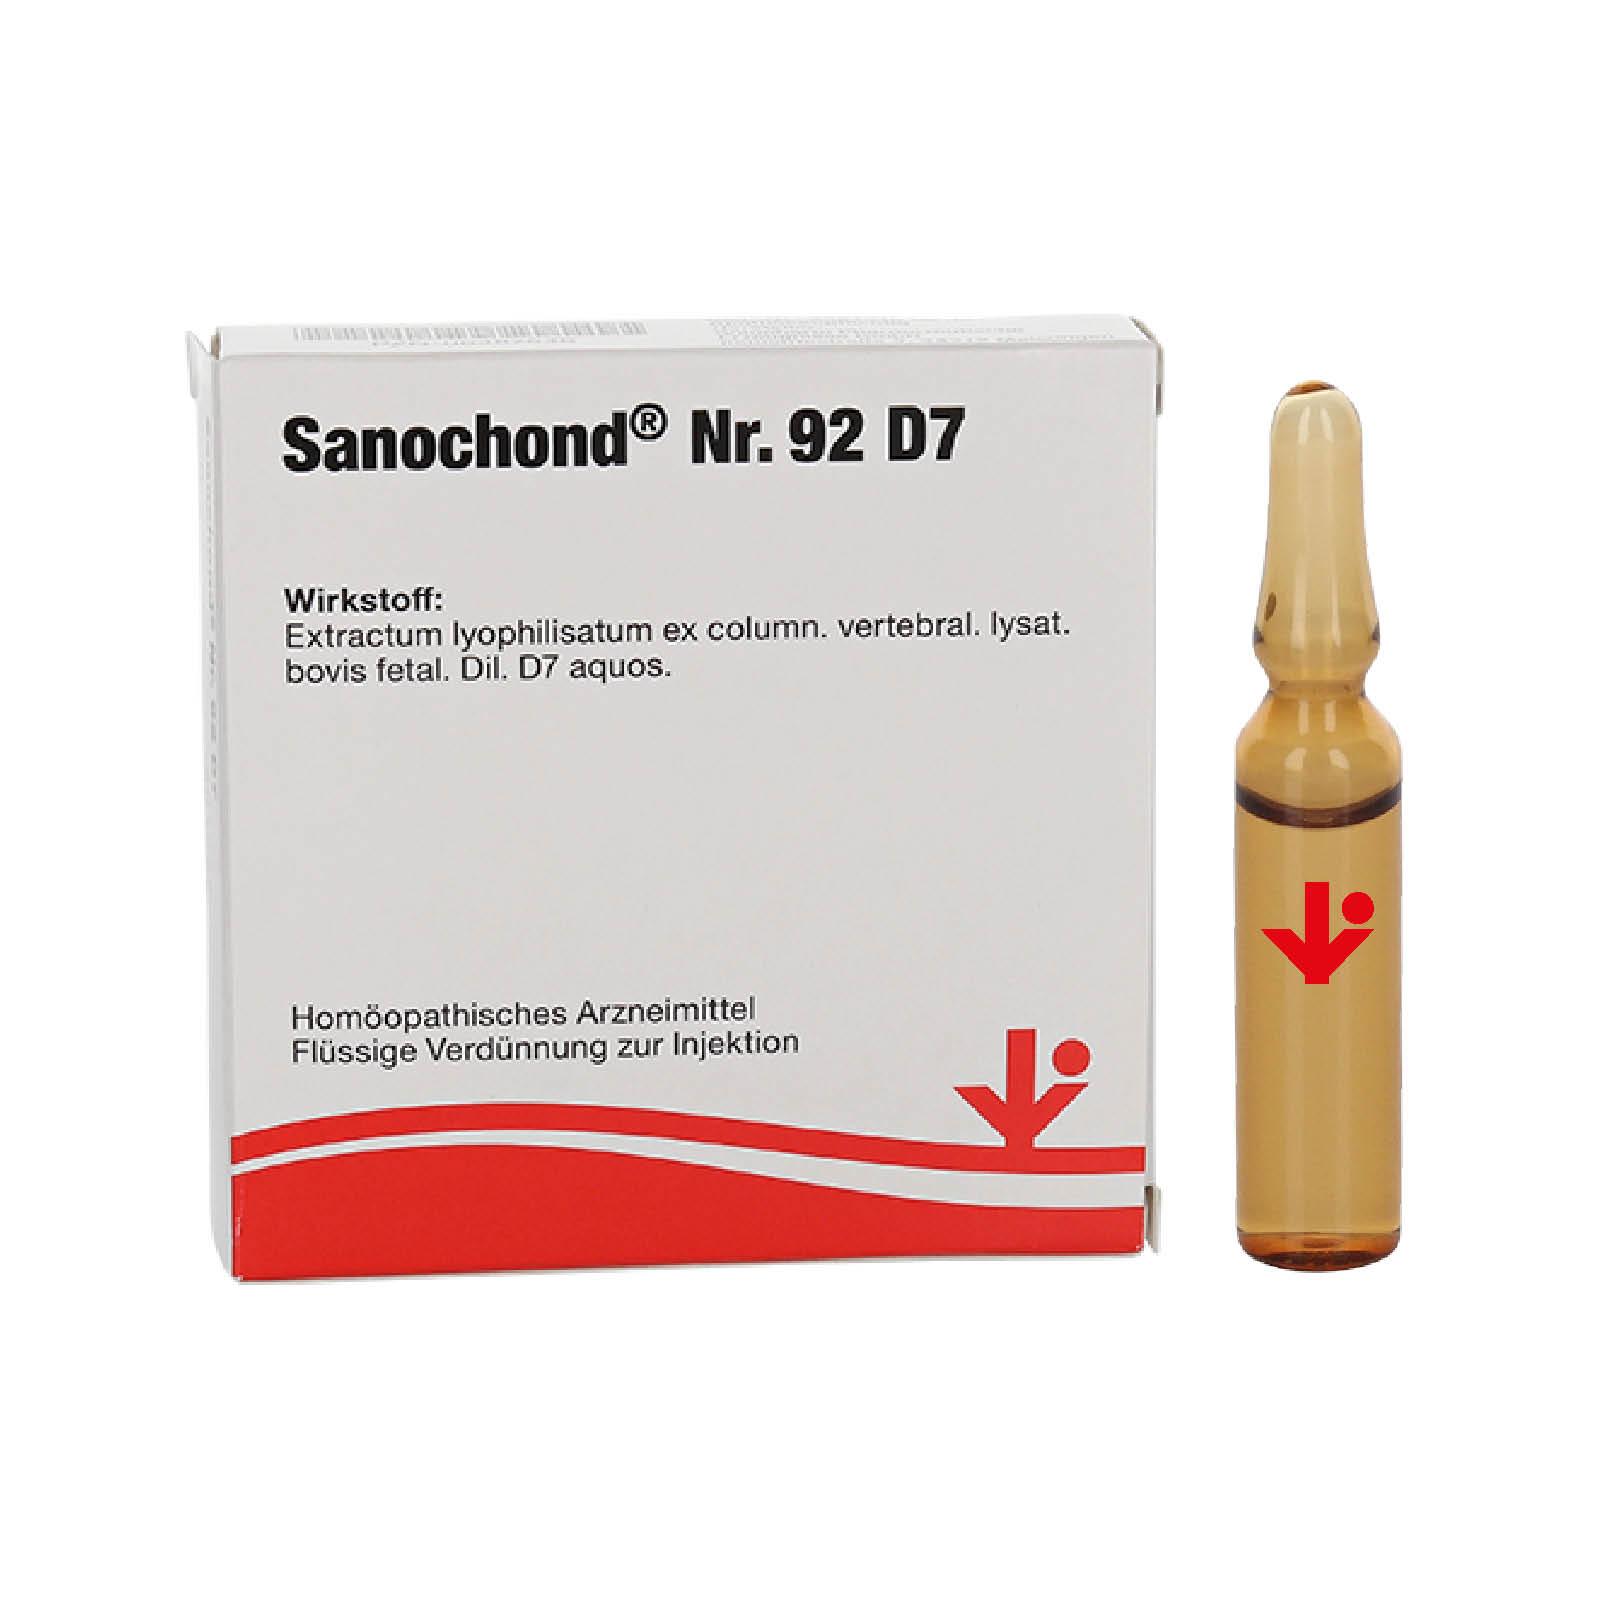 Sanochond® Nr. 92 D7